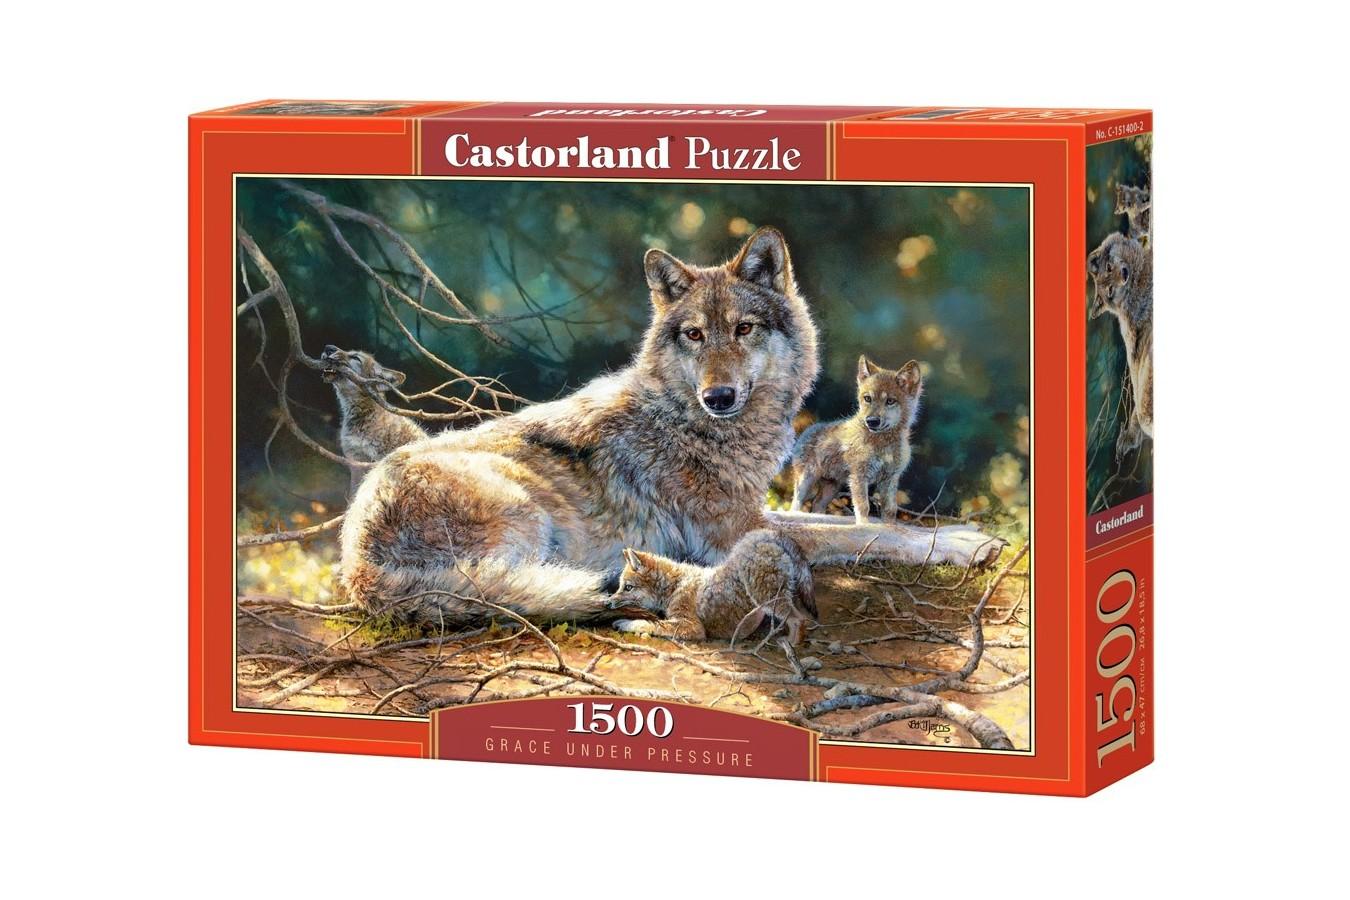 Puzzle Castorland - Grace under Pressure, 1500 piese